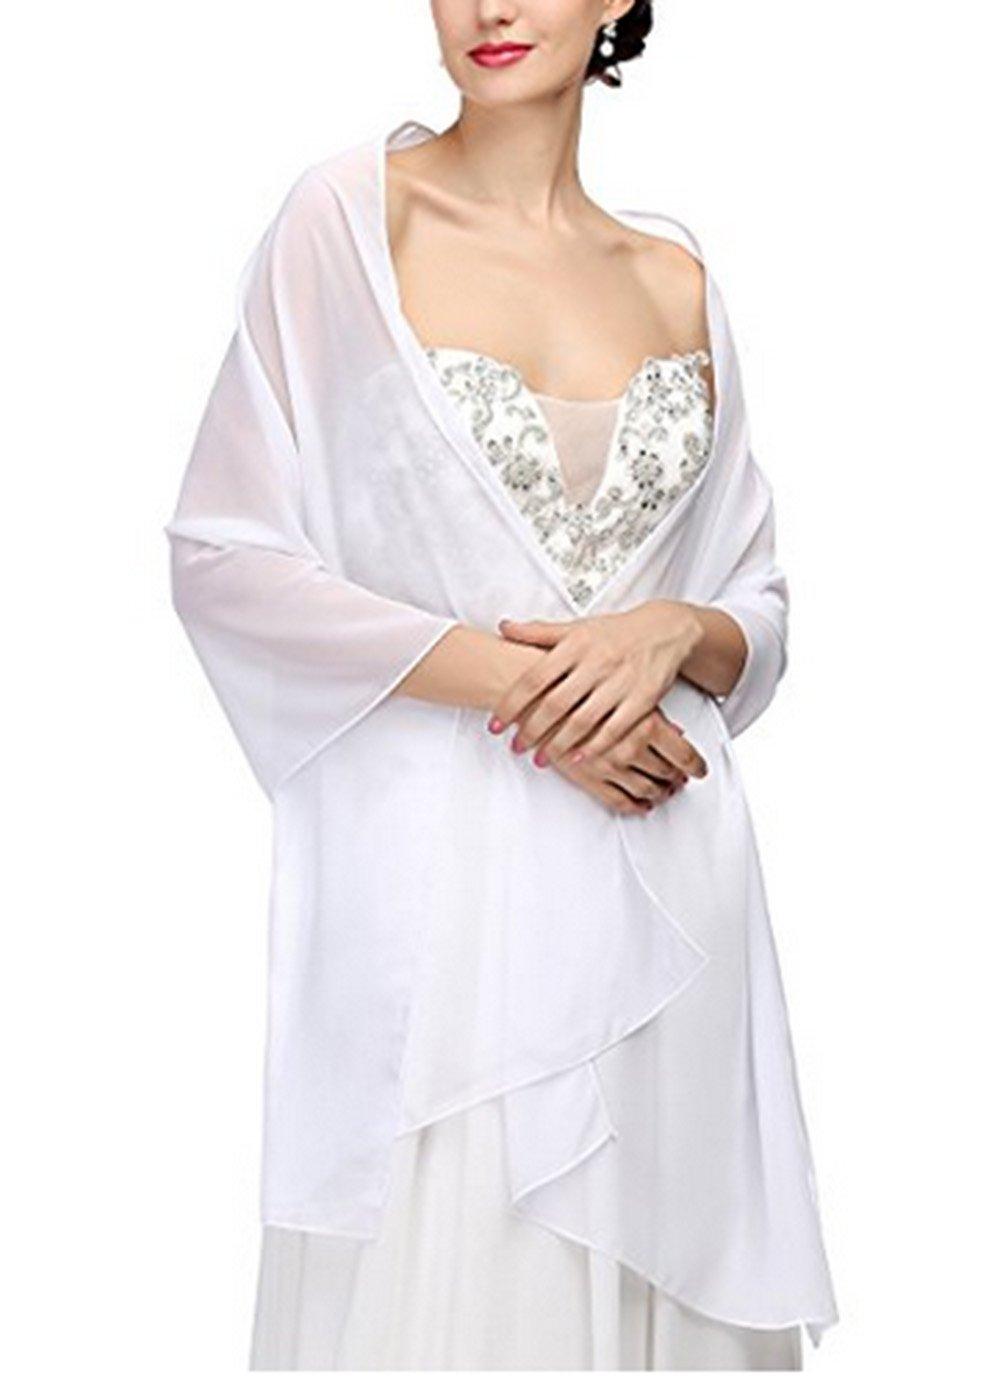 AngelaLove Chiffon Bridal Wedding Shawl Wrap Prom Evening Dress Stole Scarves (White)